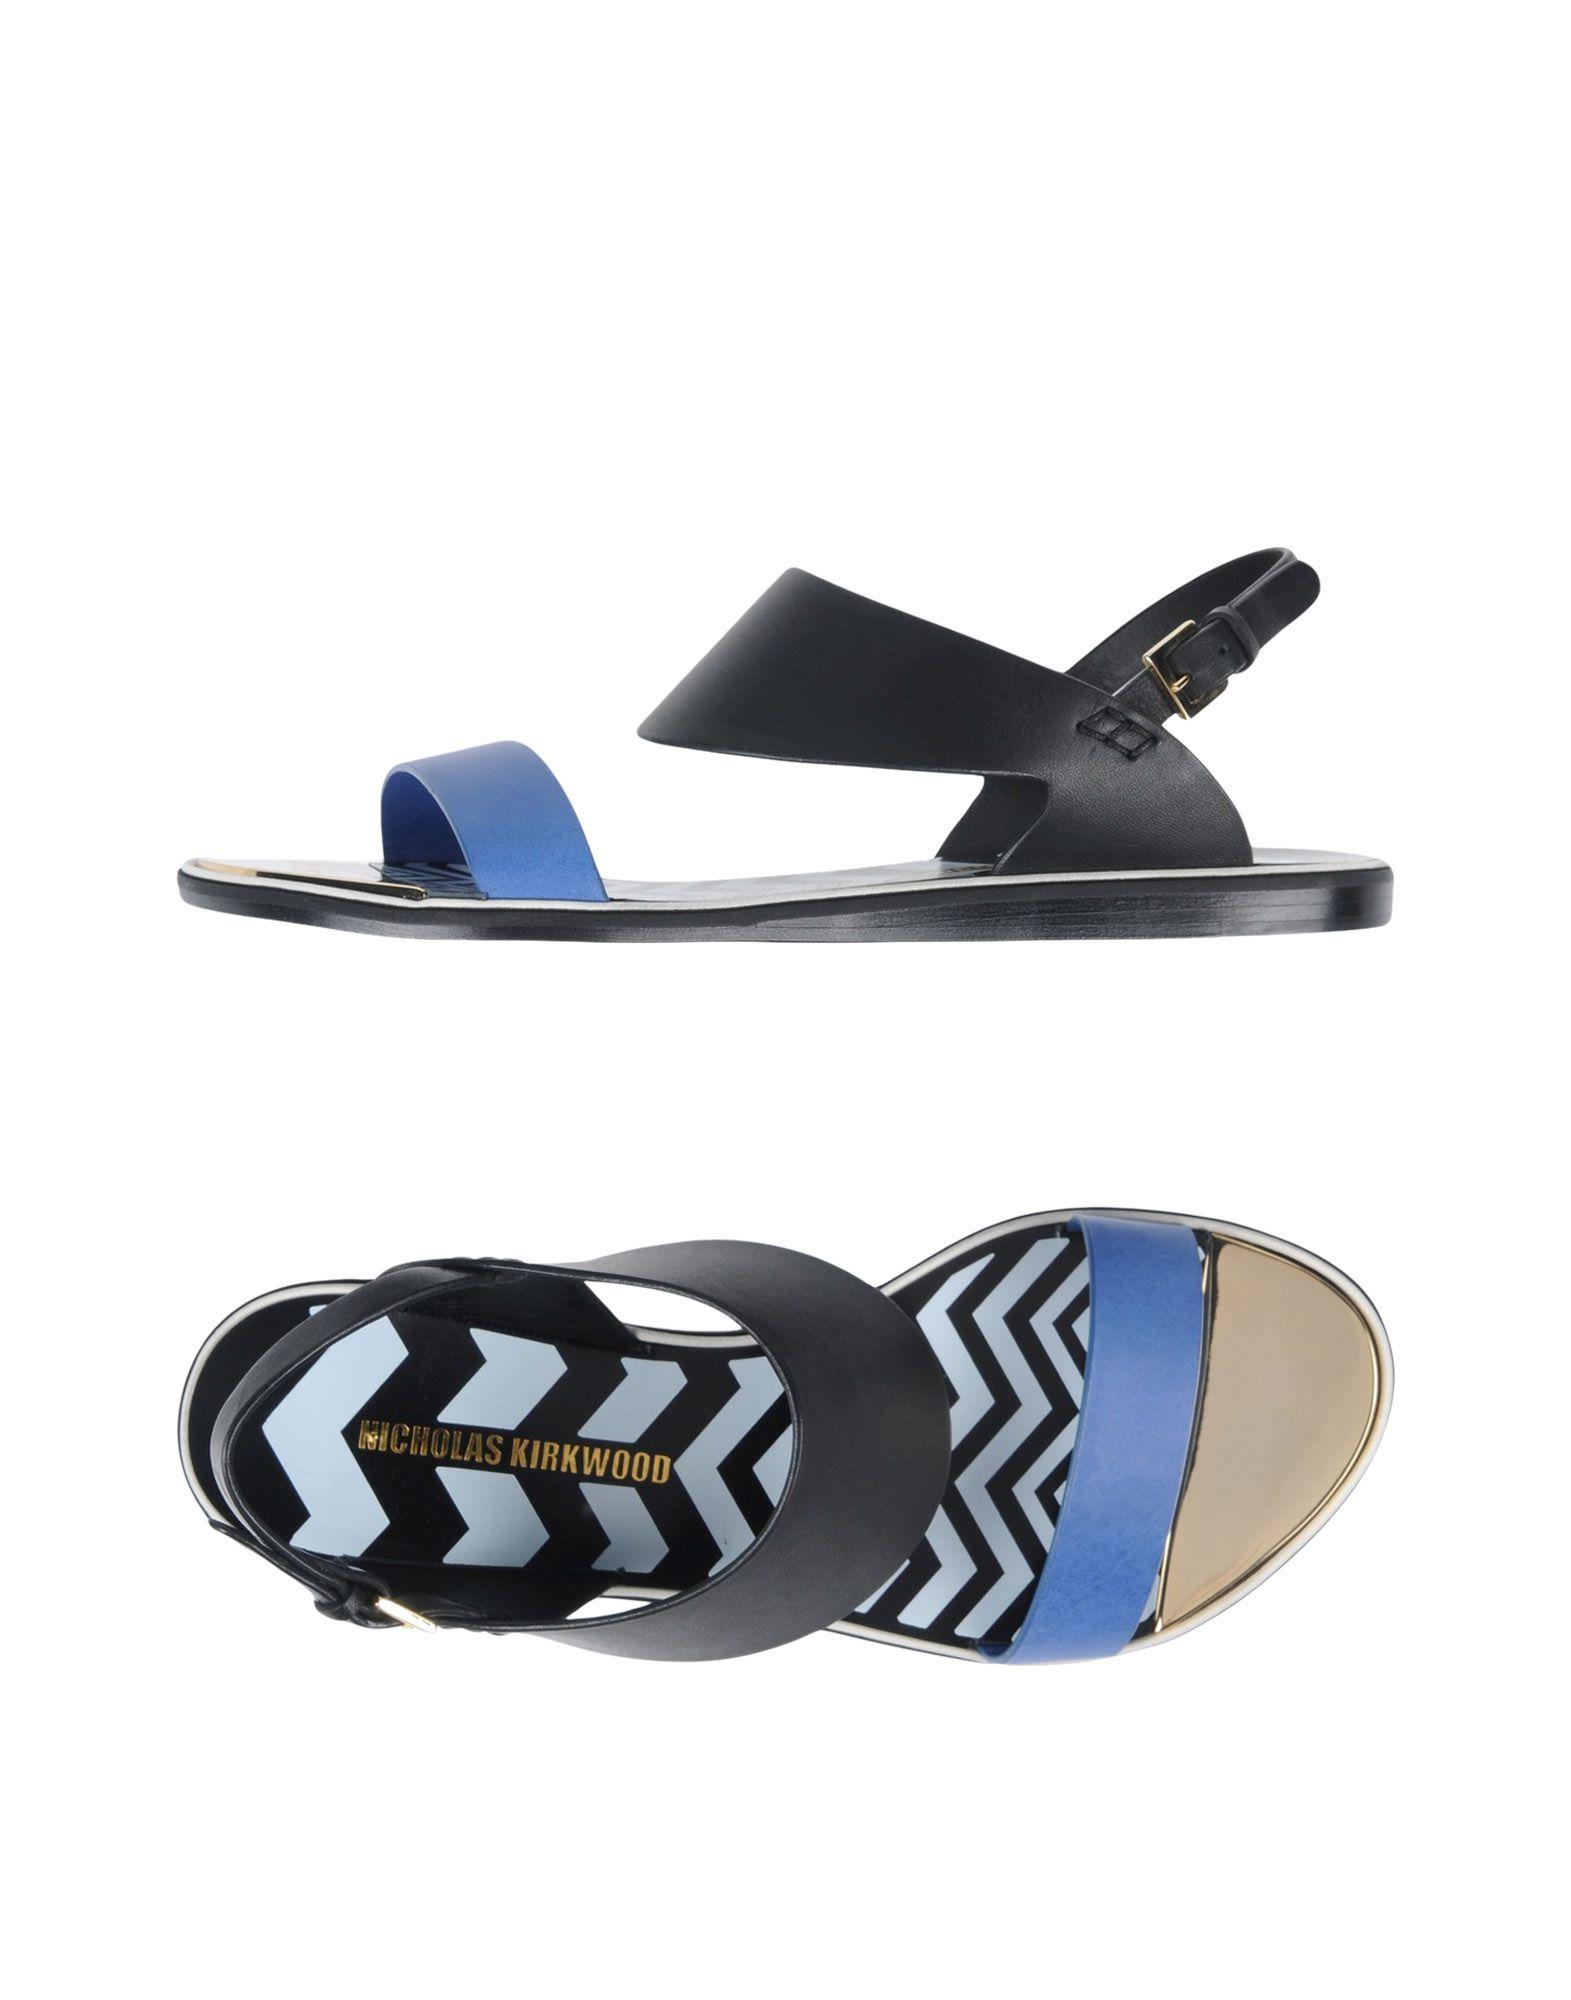 nicholas kirkwood sandales - femmes nicholas kirkwood sandales en ligne le le ligne royaume - uni - 11453643un 4c8b2a